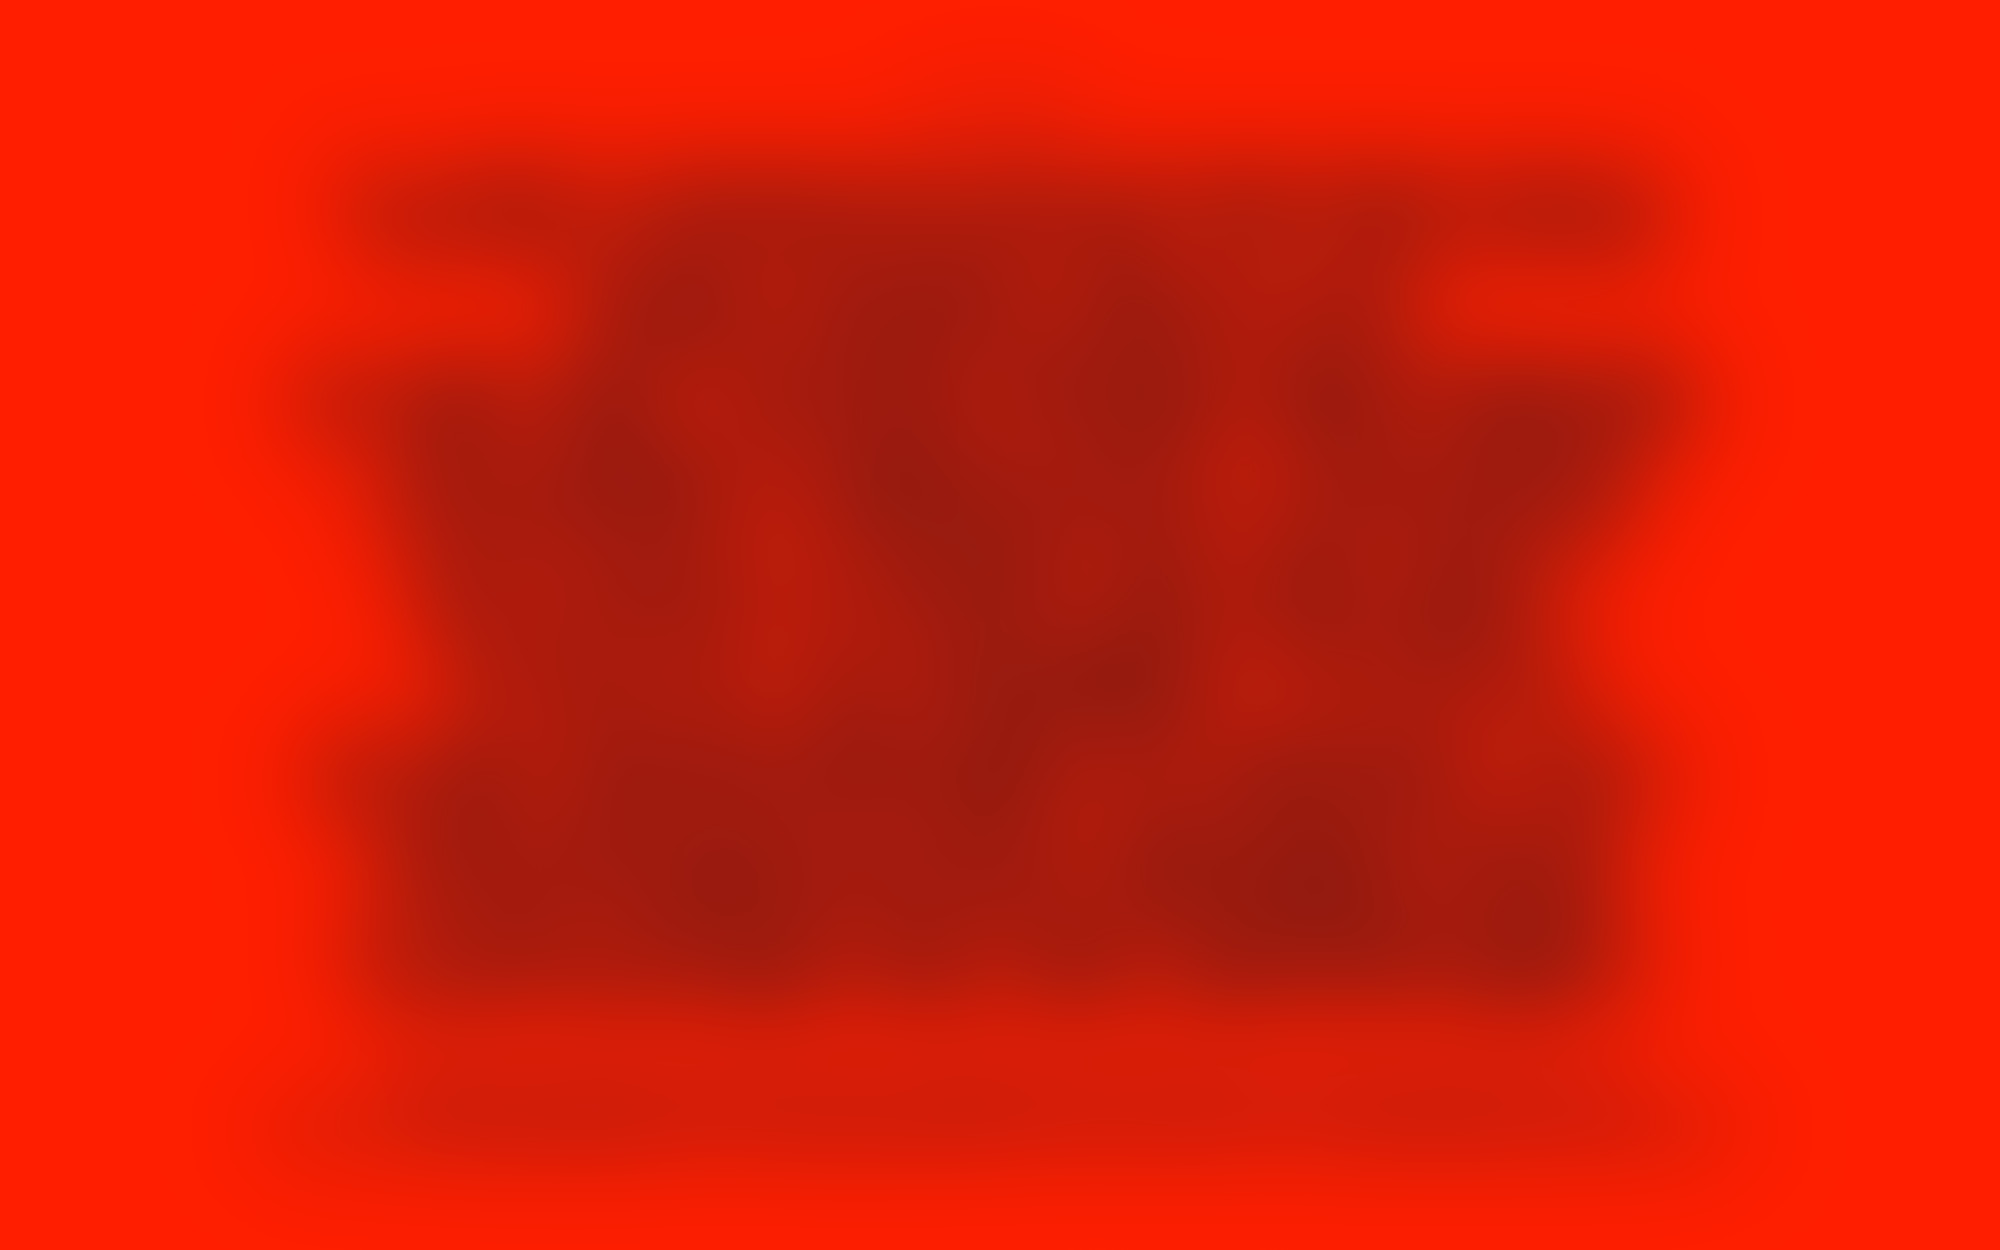 F1 type turbo autocompressfitresizeixlibphp 1 1 0max h2000max w3 D2000q80sfd1e91926e9f8c11c2ad31fad398d850